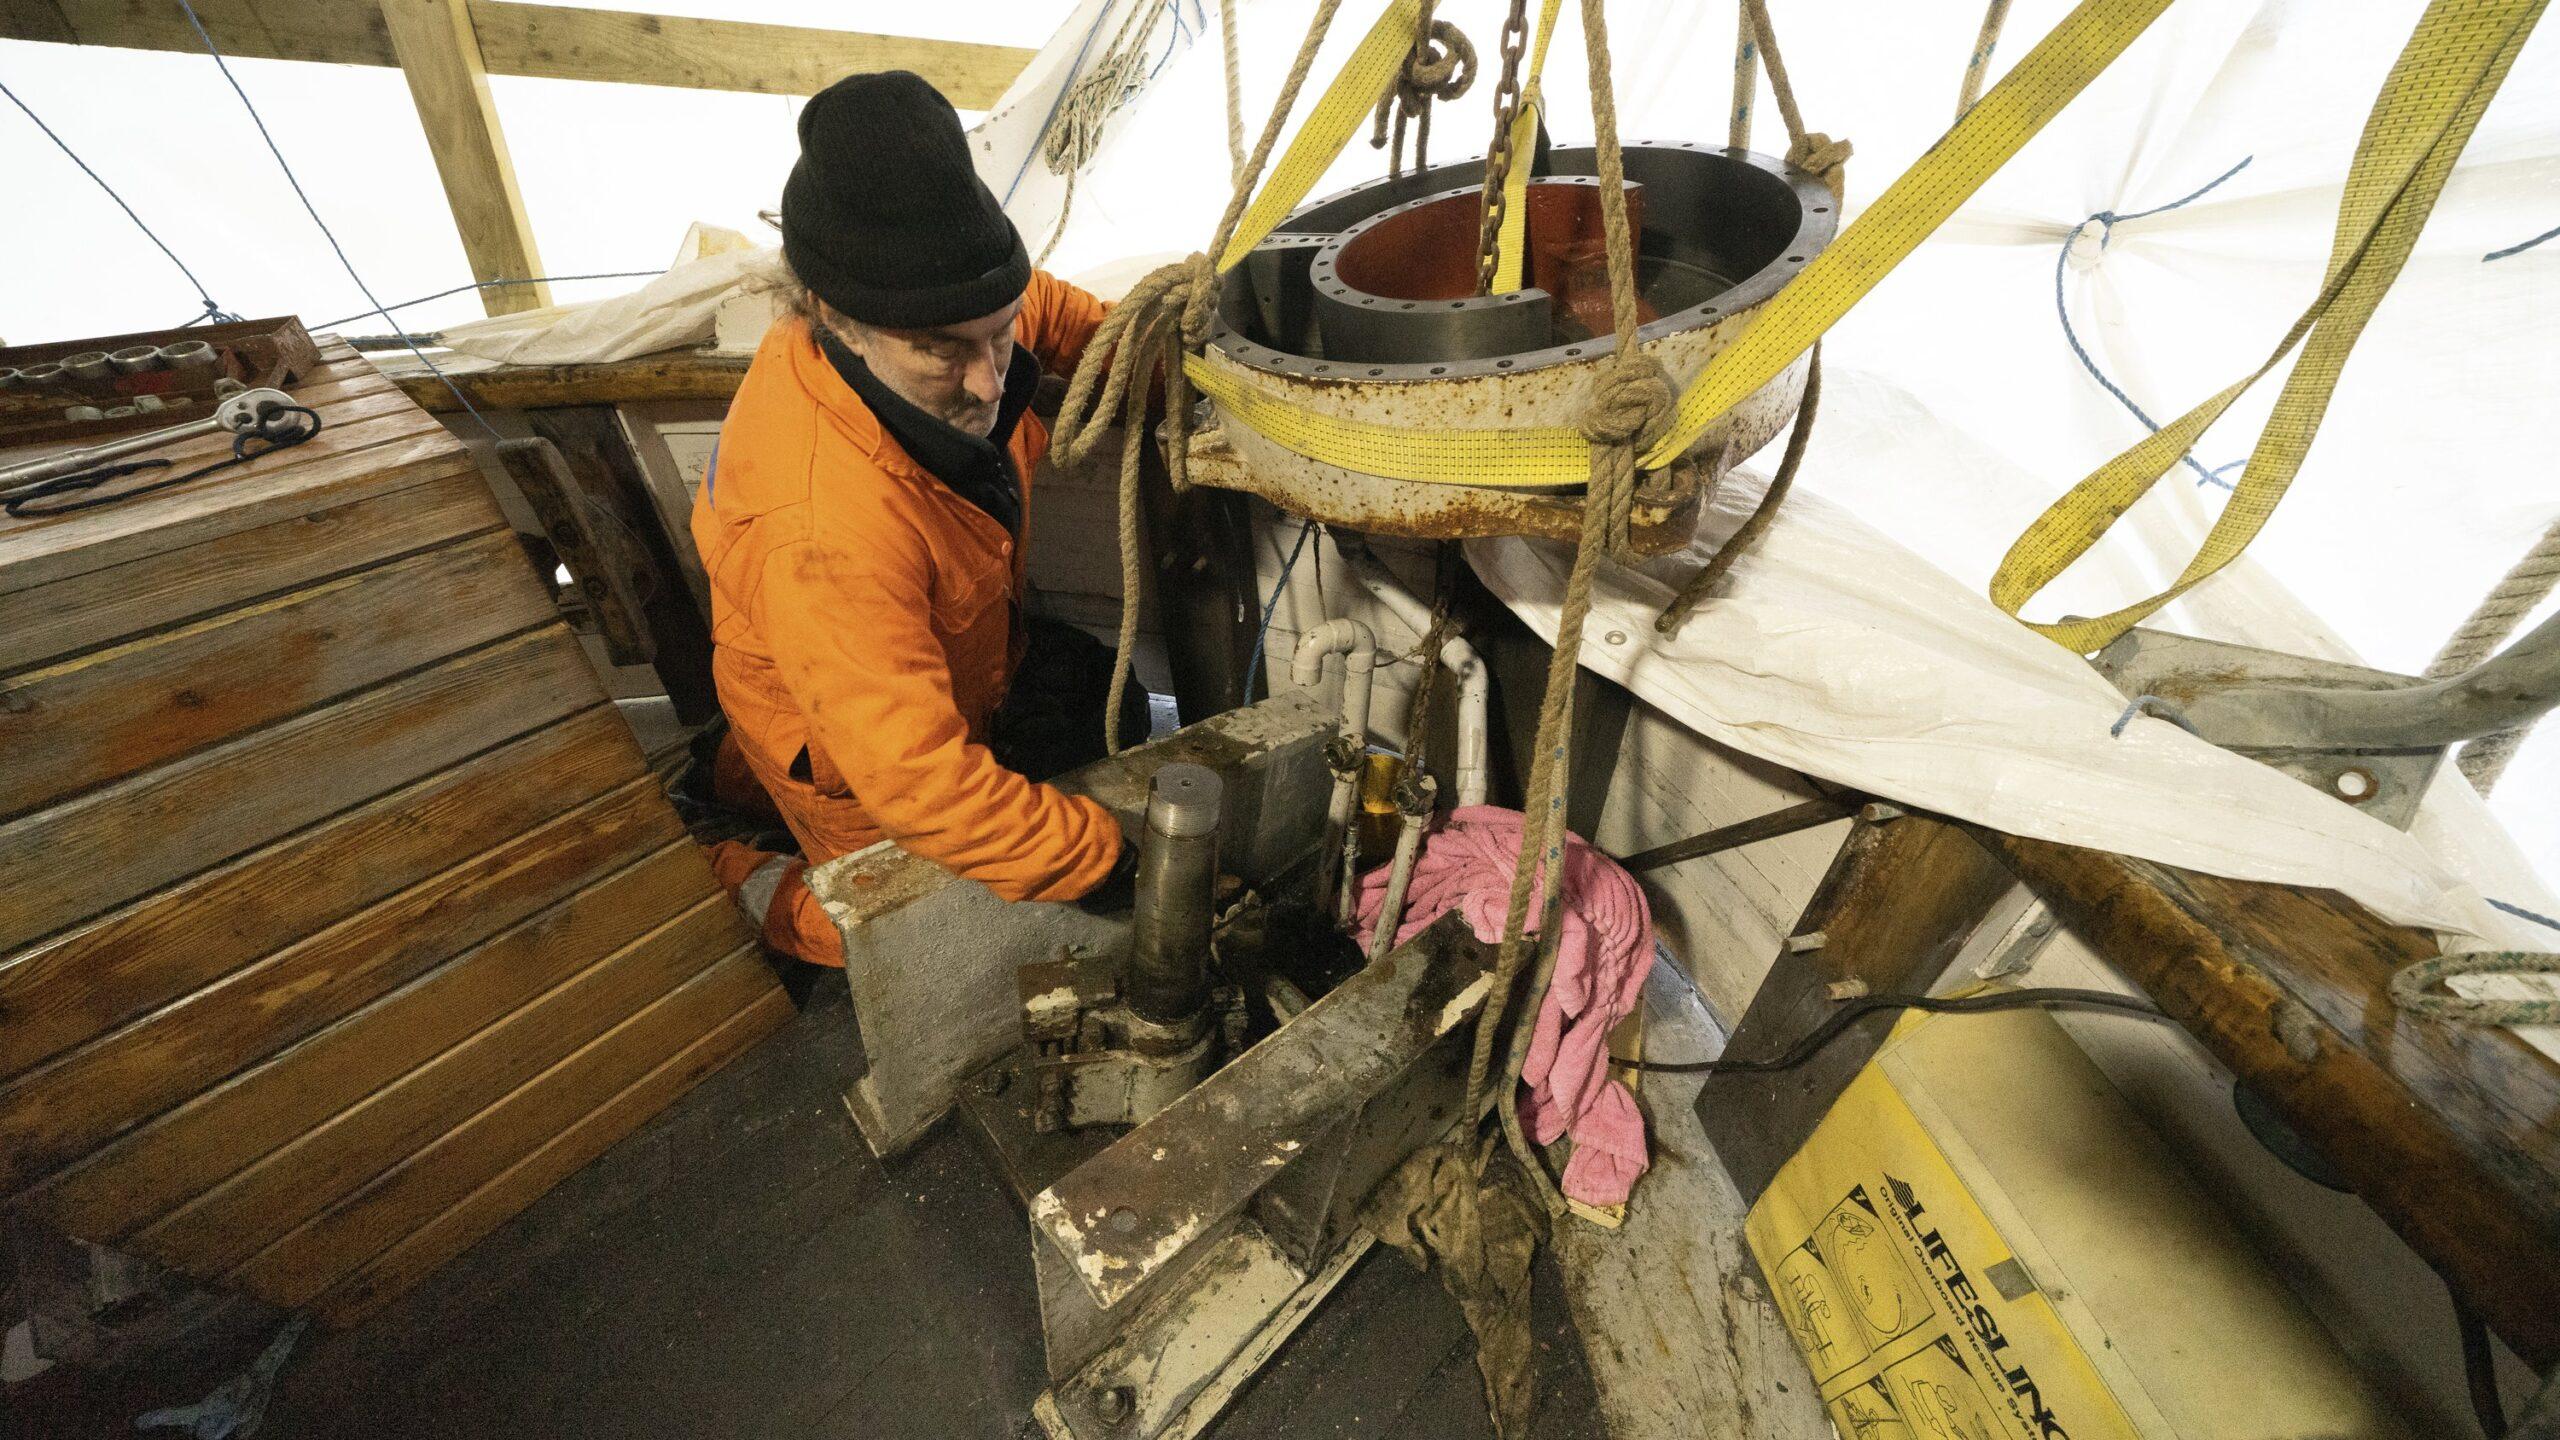 Man lifting large metal component